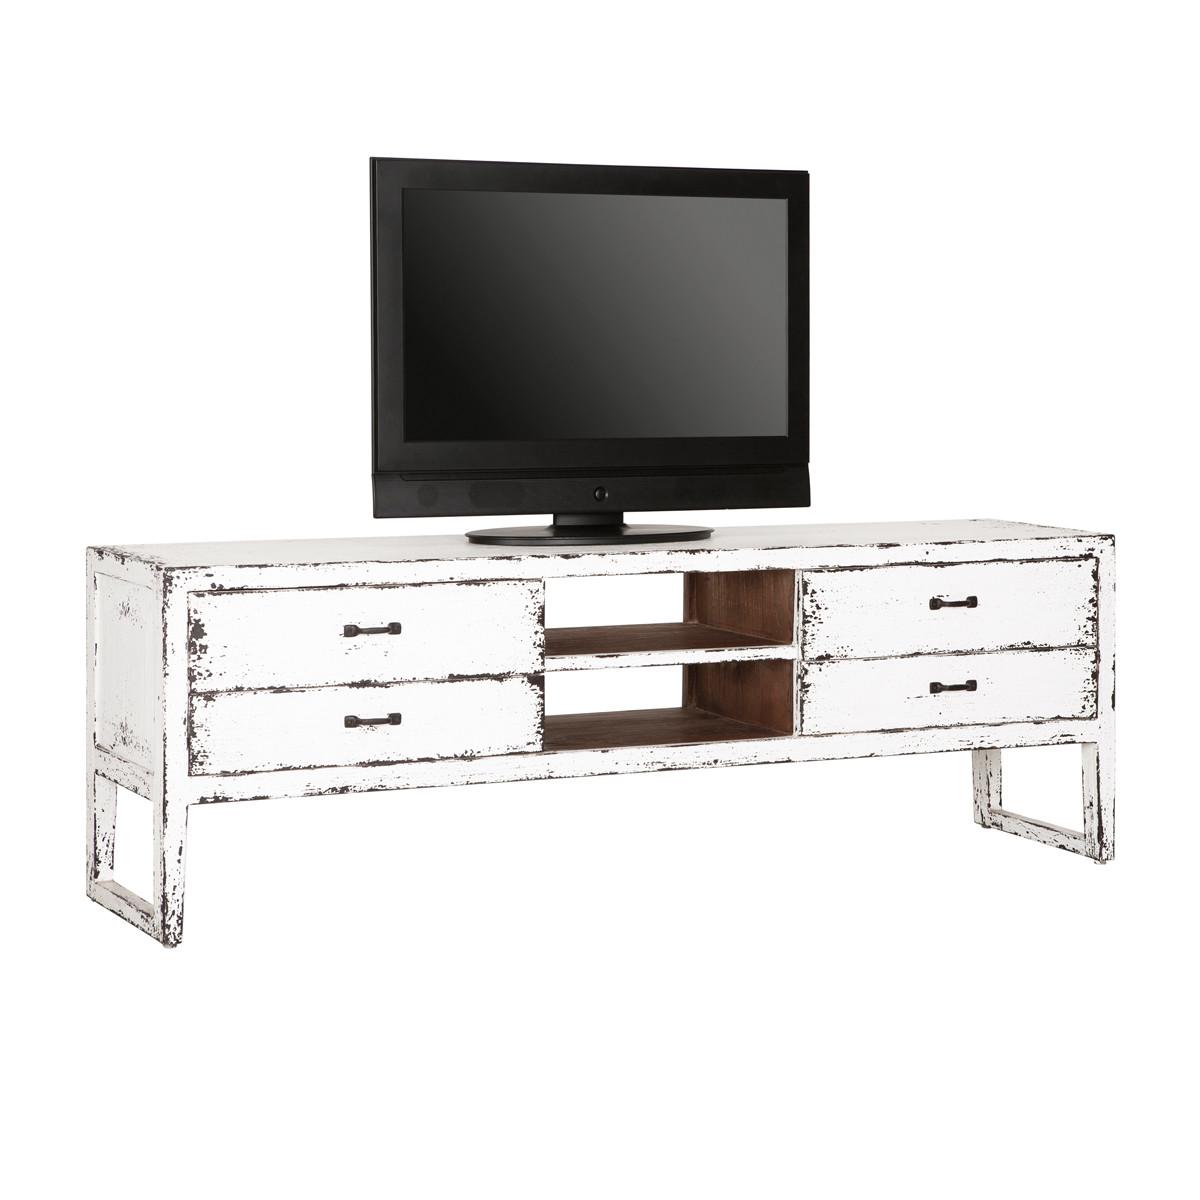 Tv Meubel White Wash.Must Living Ghost Tv Meubel White Wash Ml 410303 Lumz